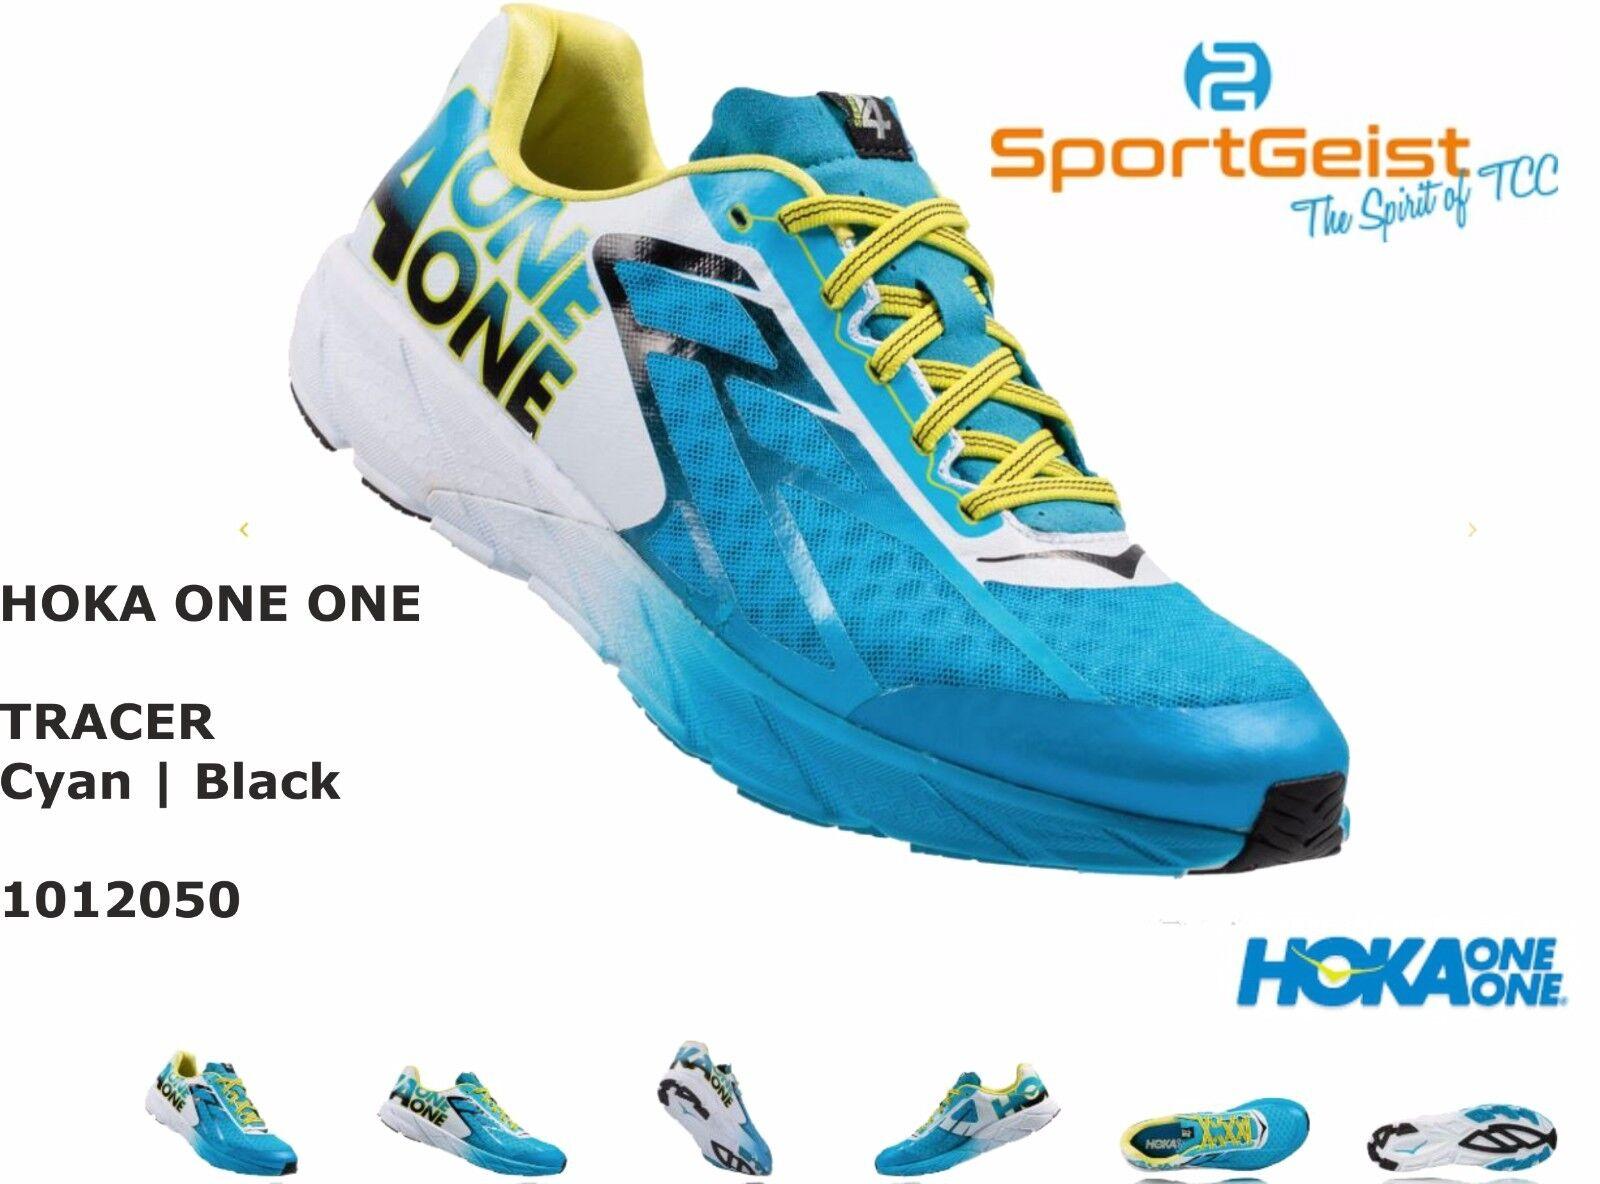 Hoka One One TRACER 1012050 Herren Speedschuh Wettkampf Tempo Gr 40 2/3